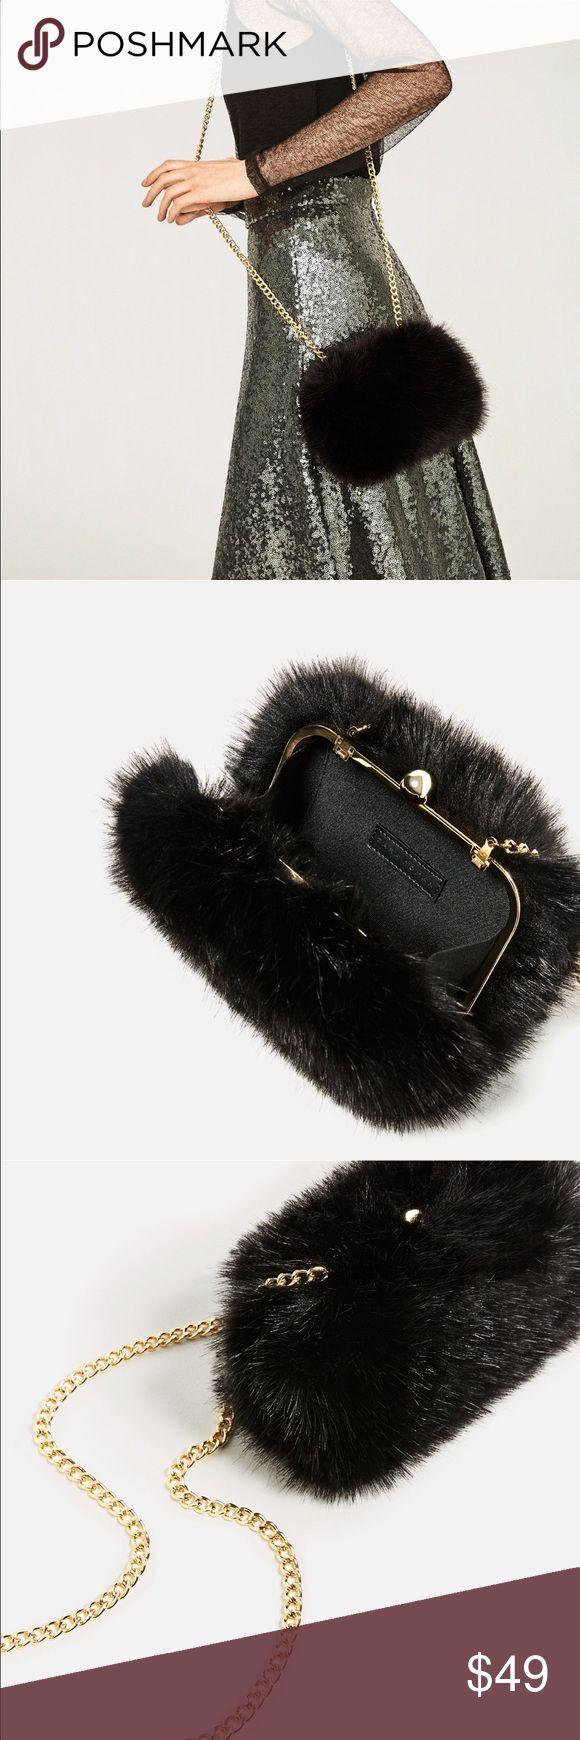 Zara Bag Faux Fur Bag! Zara Sold Out Online. New W/O Tags 😊 Zara Bags